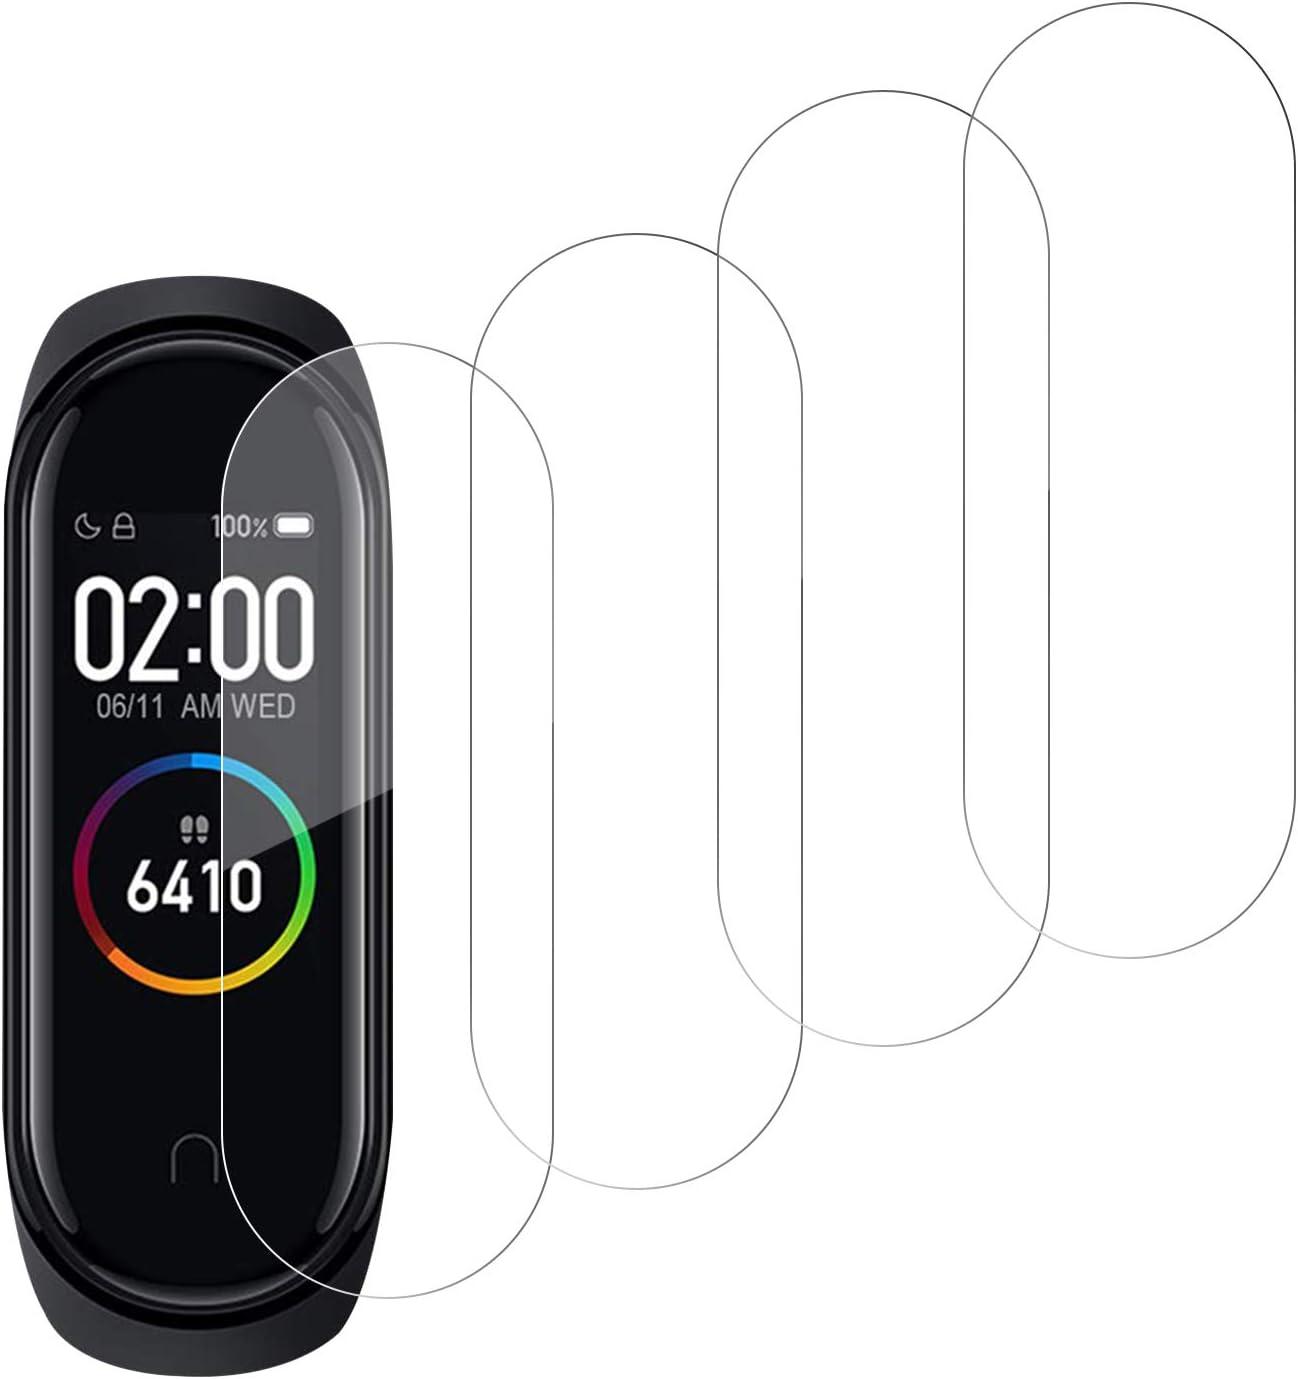 SNUNGPHIR® 4pcs Protector de Pantalla para Xiaomi Mi Band 4 Película Protectora de Alta Definición Anti-Arañazo Ultra Delgado TPU Protector Pantalla para el Reloj Xiaomi Mi Band 4